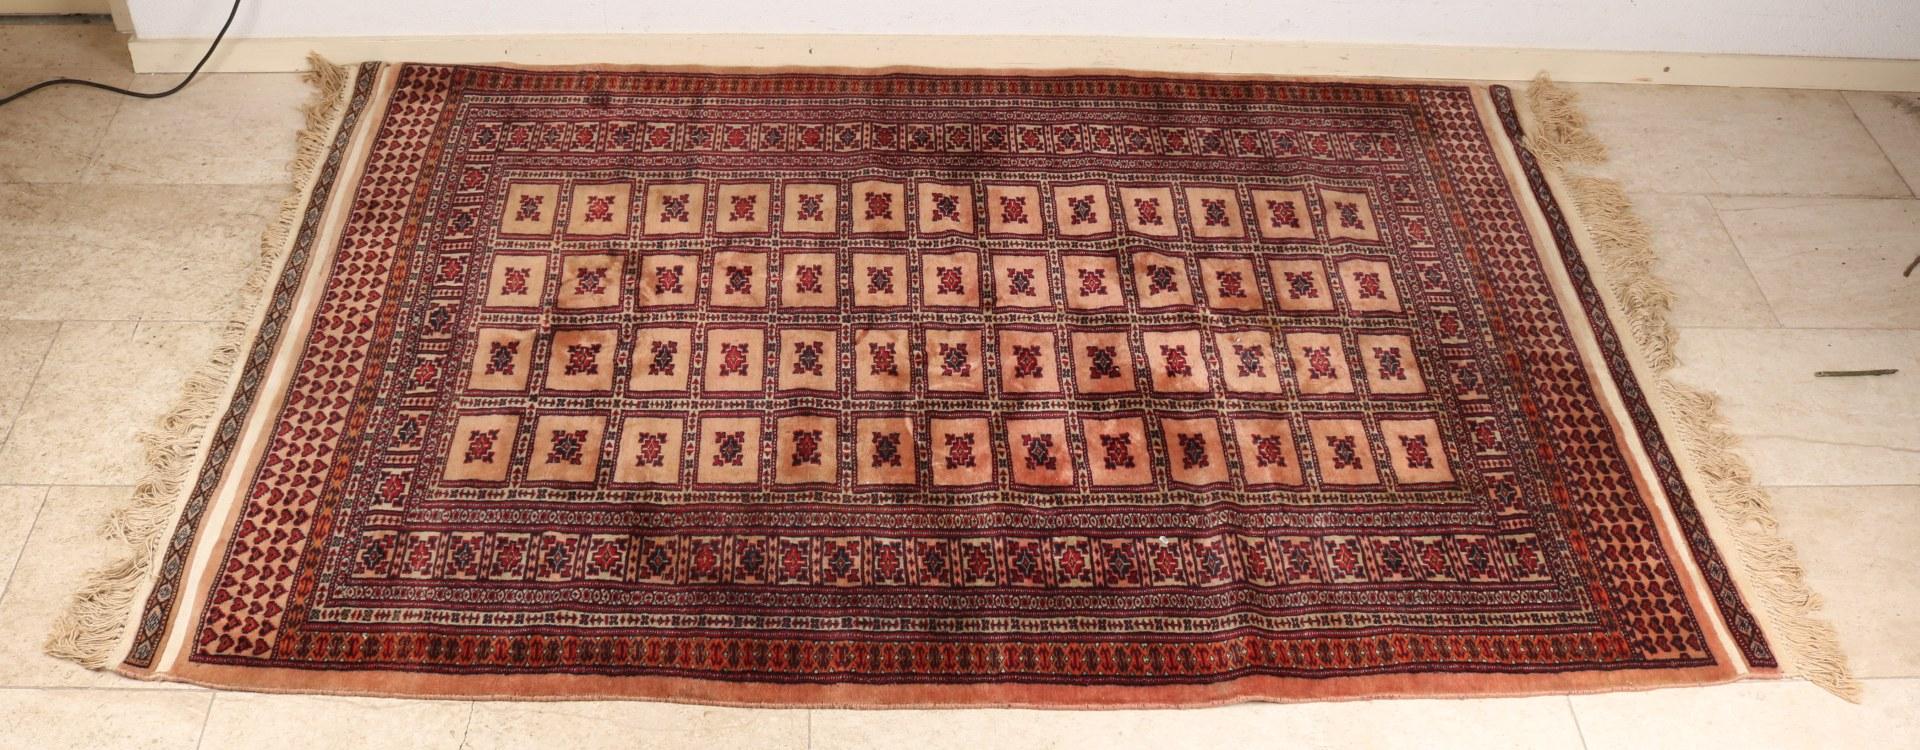 Perzisch tapijt, 123 x 189 cm